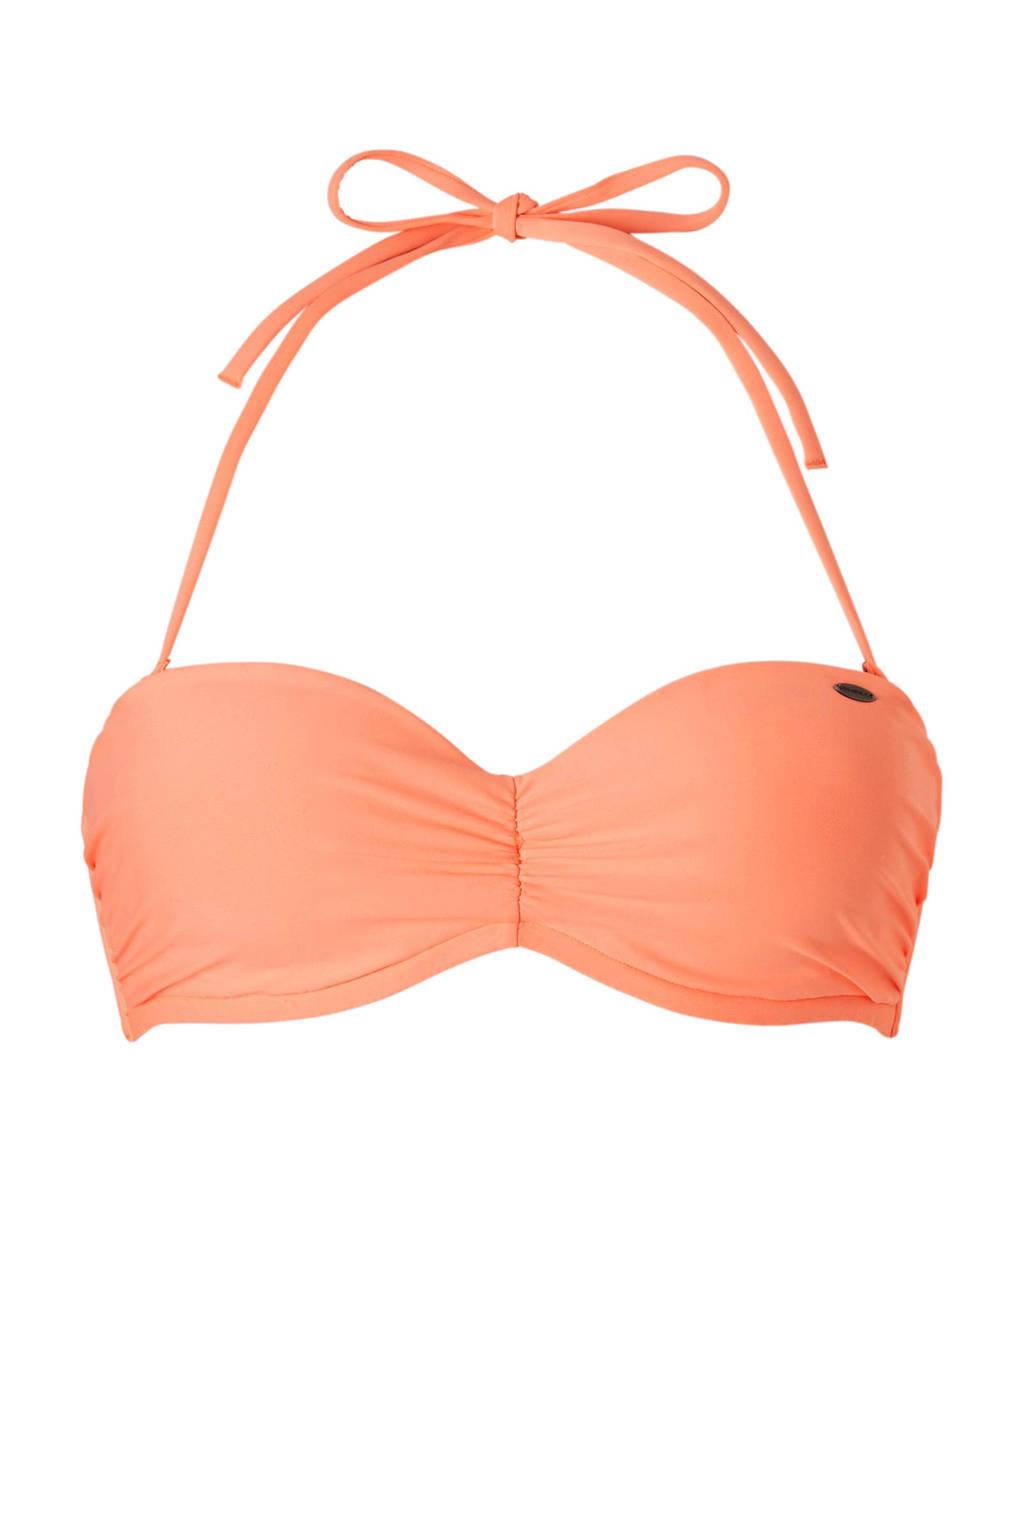 O'Neill bandeau bikinitop neon oranje, Neon oranje